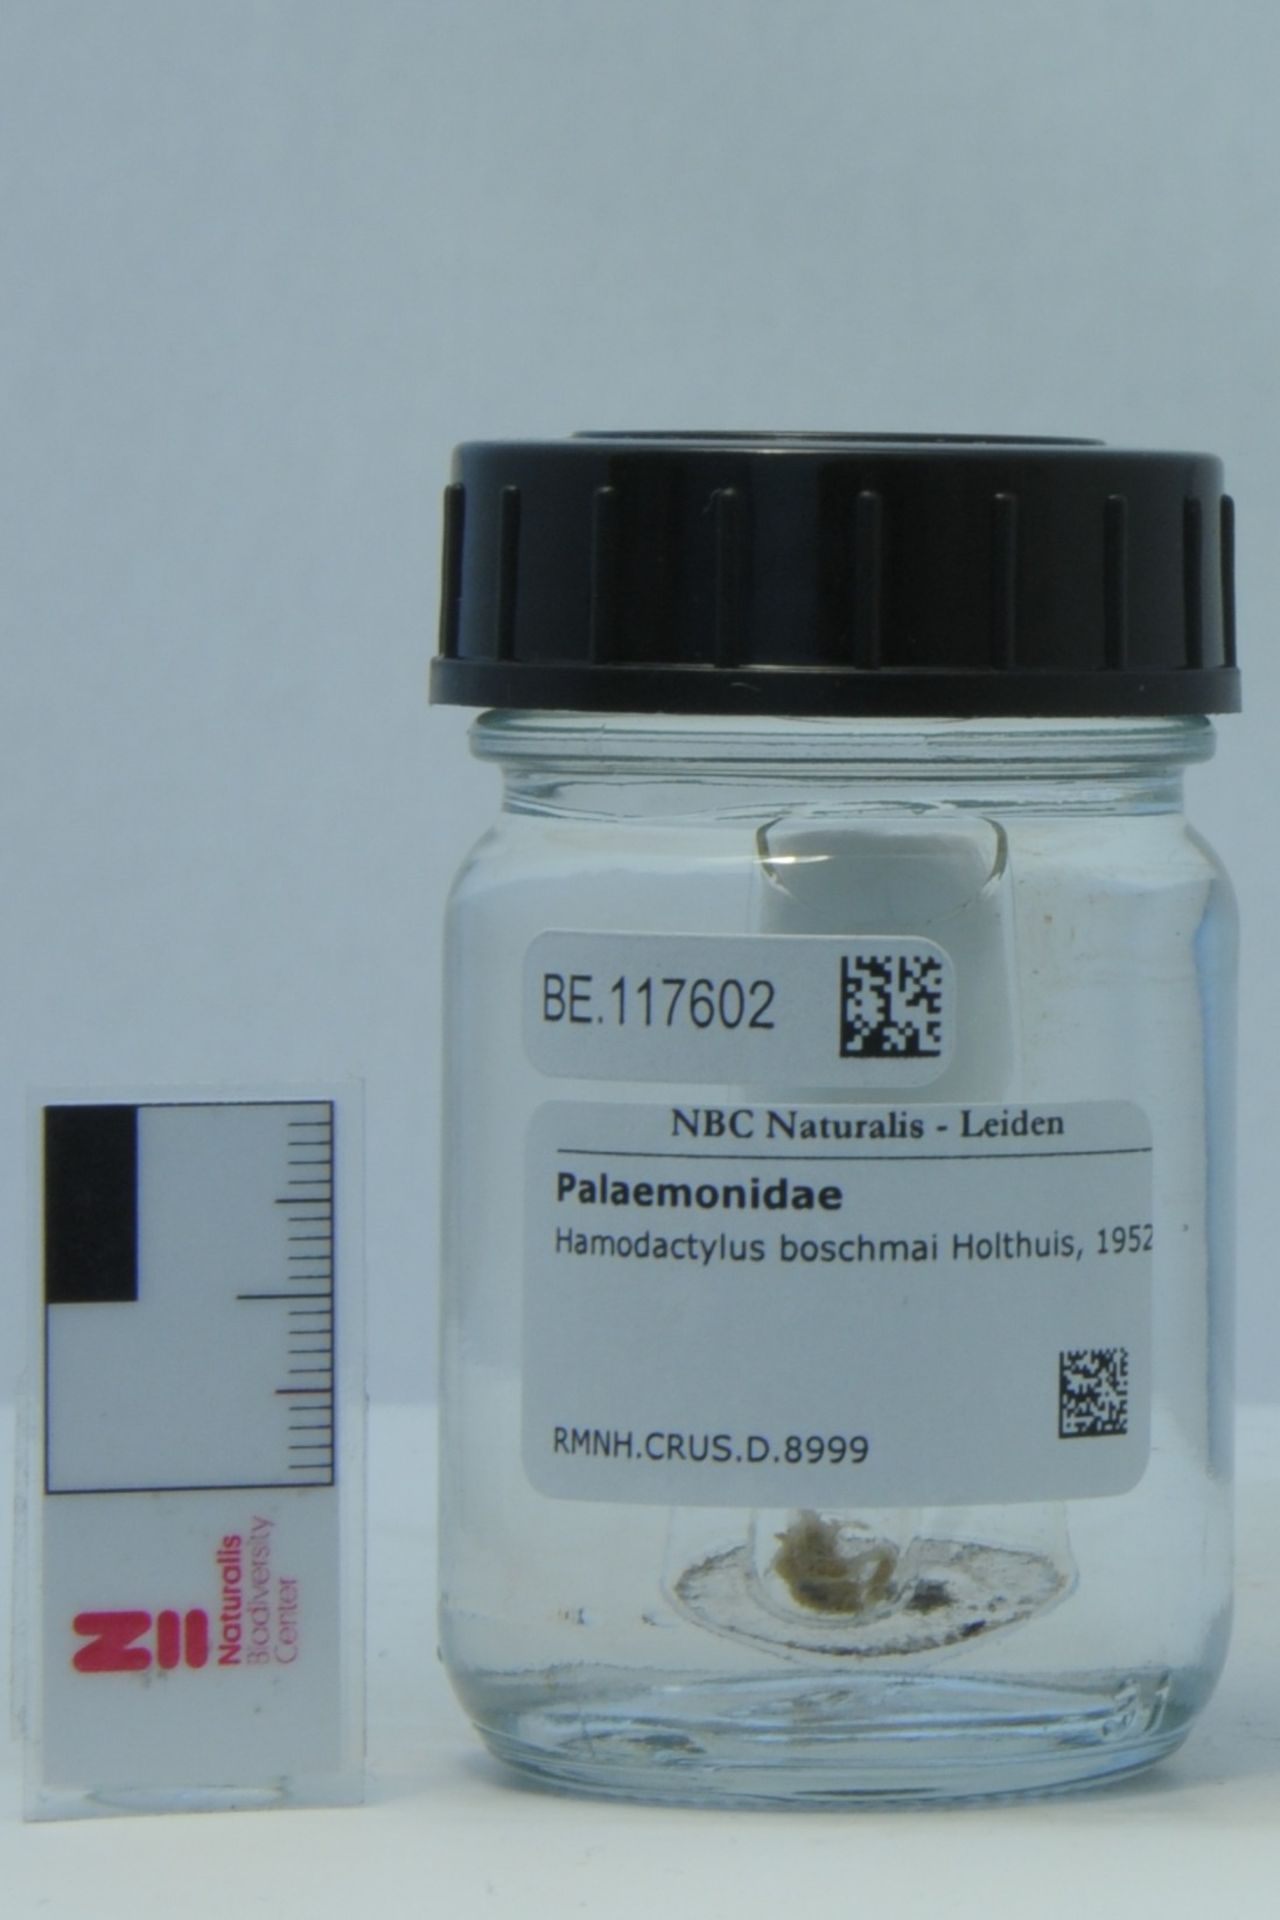 RMNH.CRUS.D.8999   Hamodactylus boschmai Holthuis, 1952